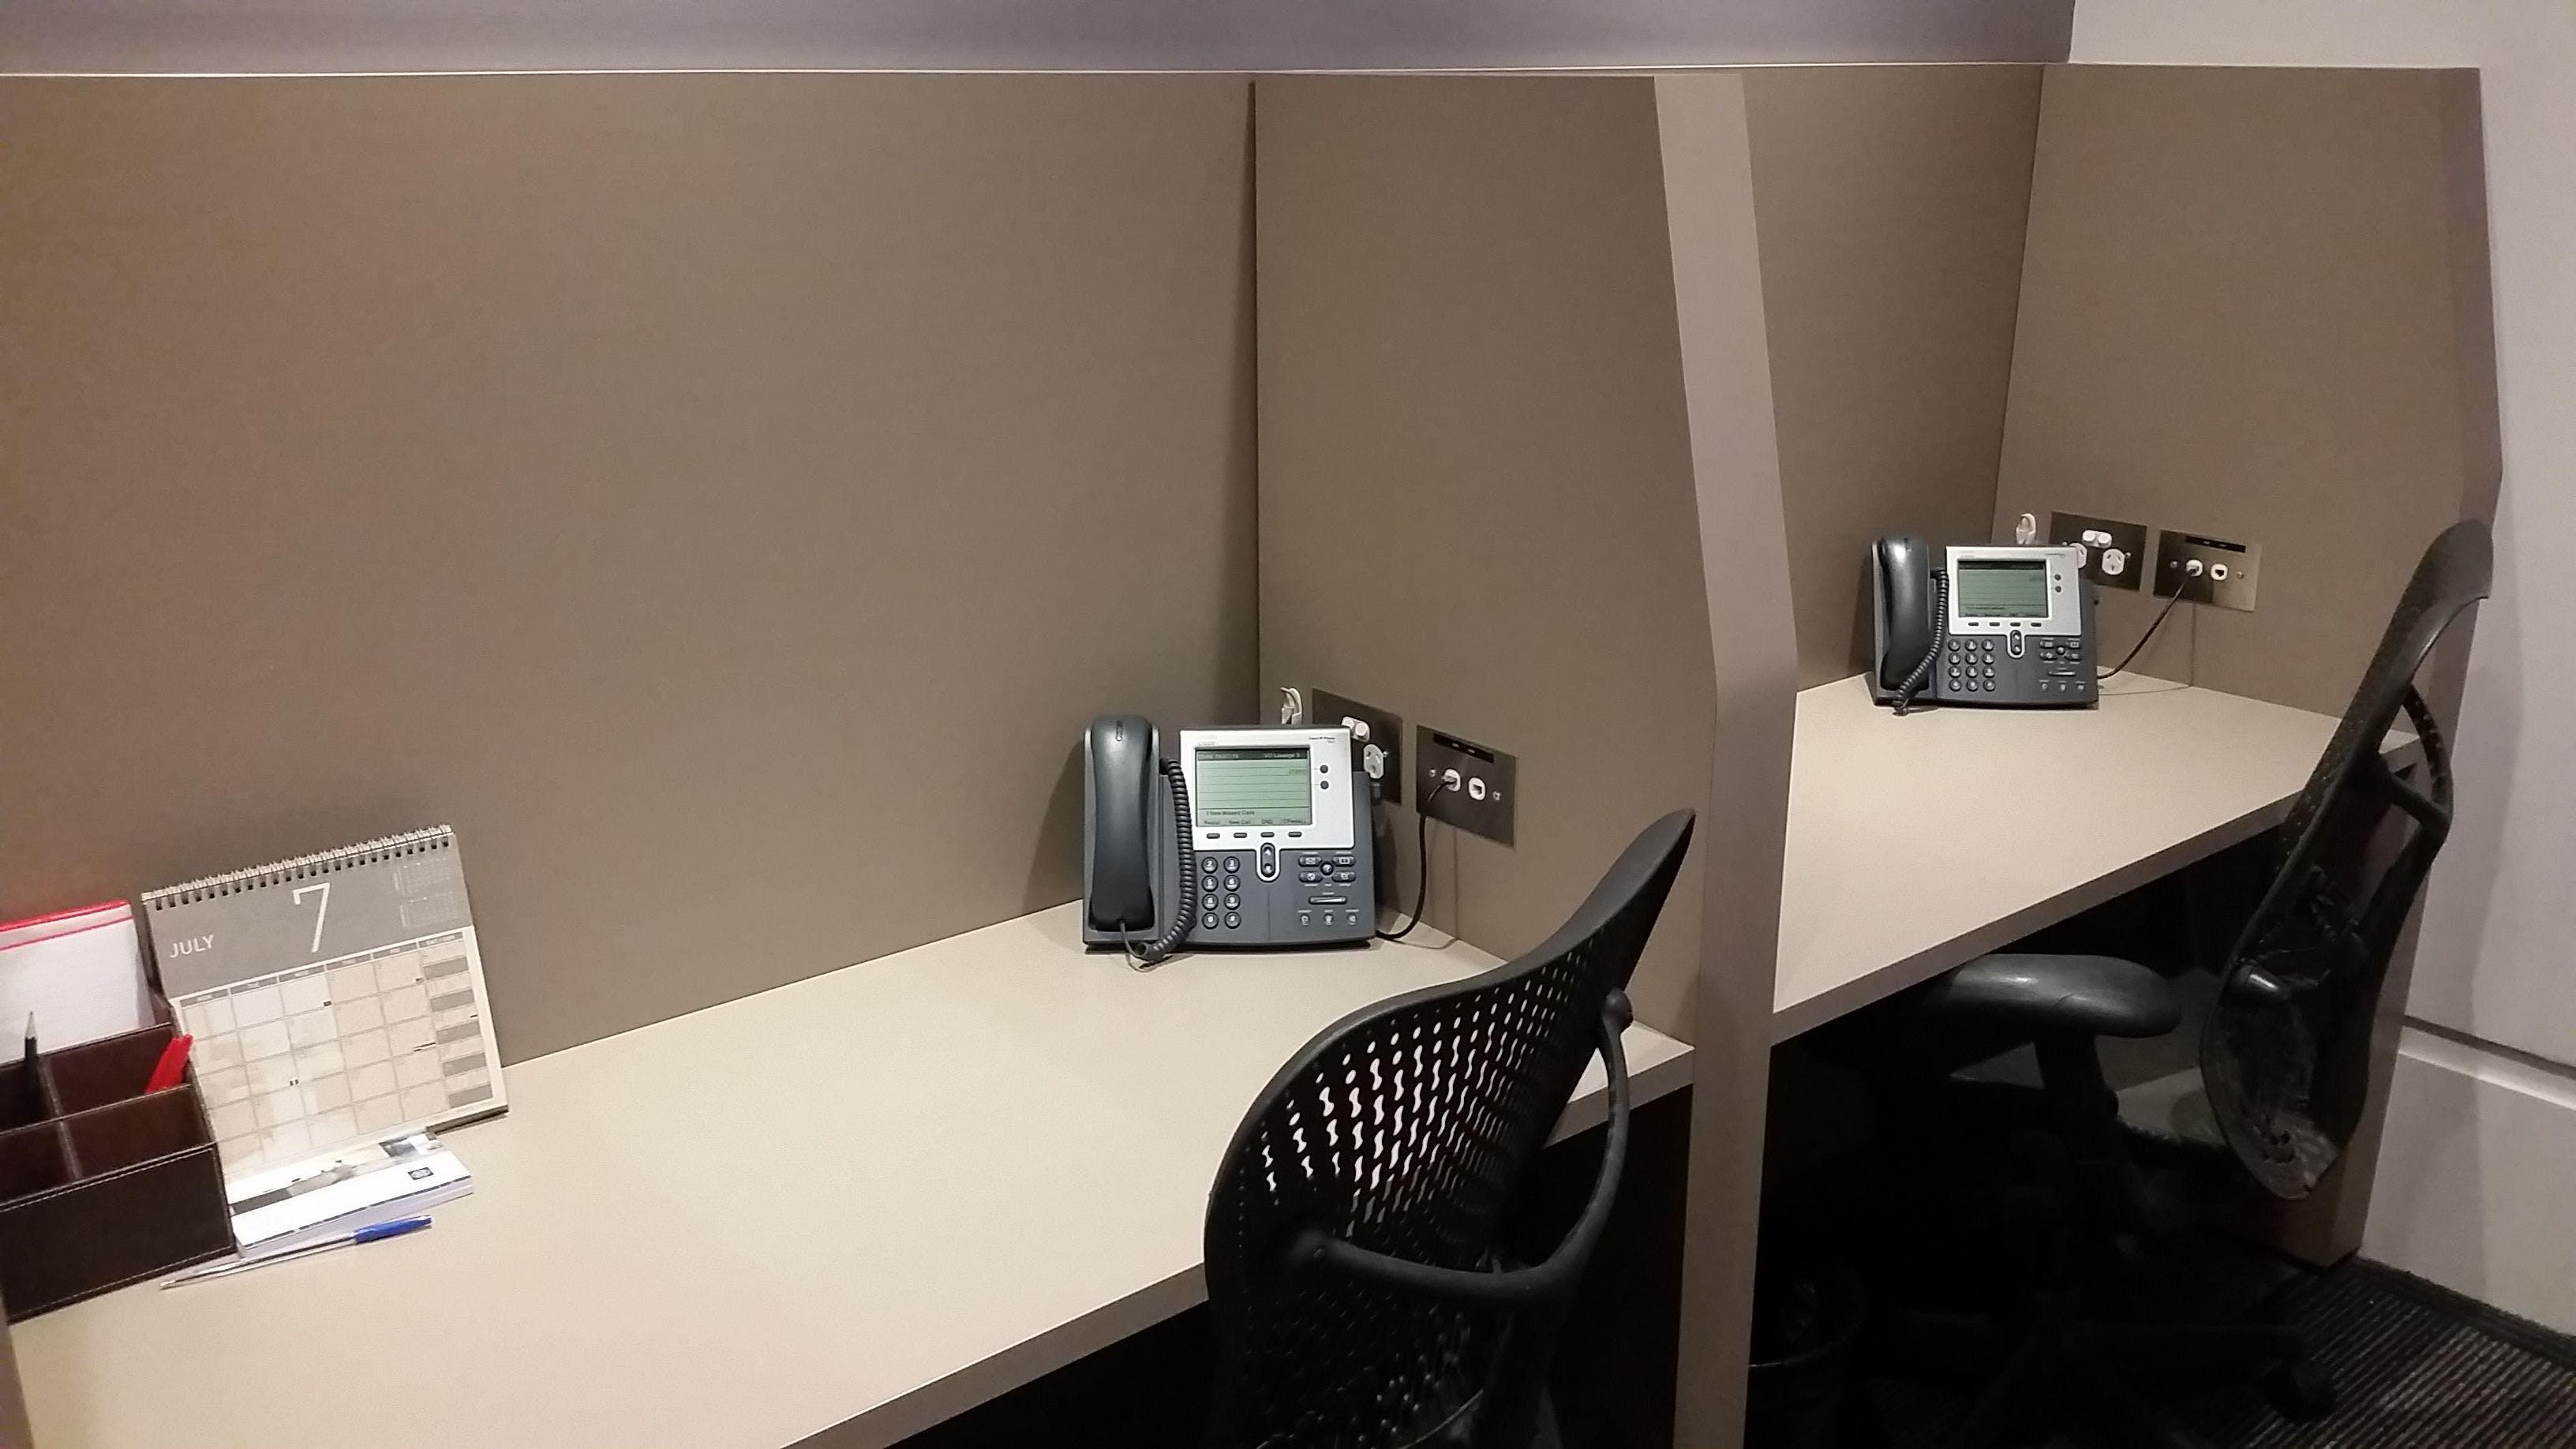 Hot desk at Aurora Place, image 4